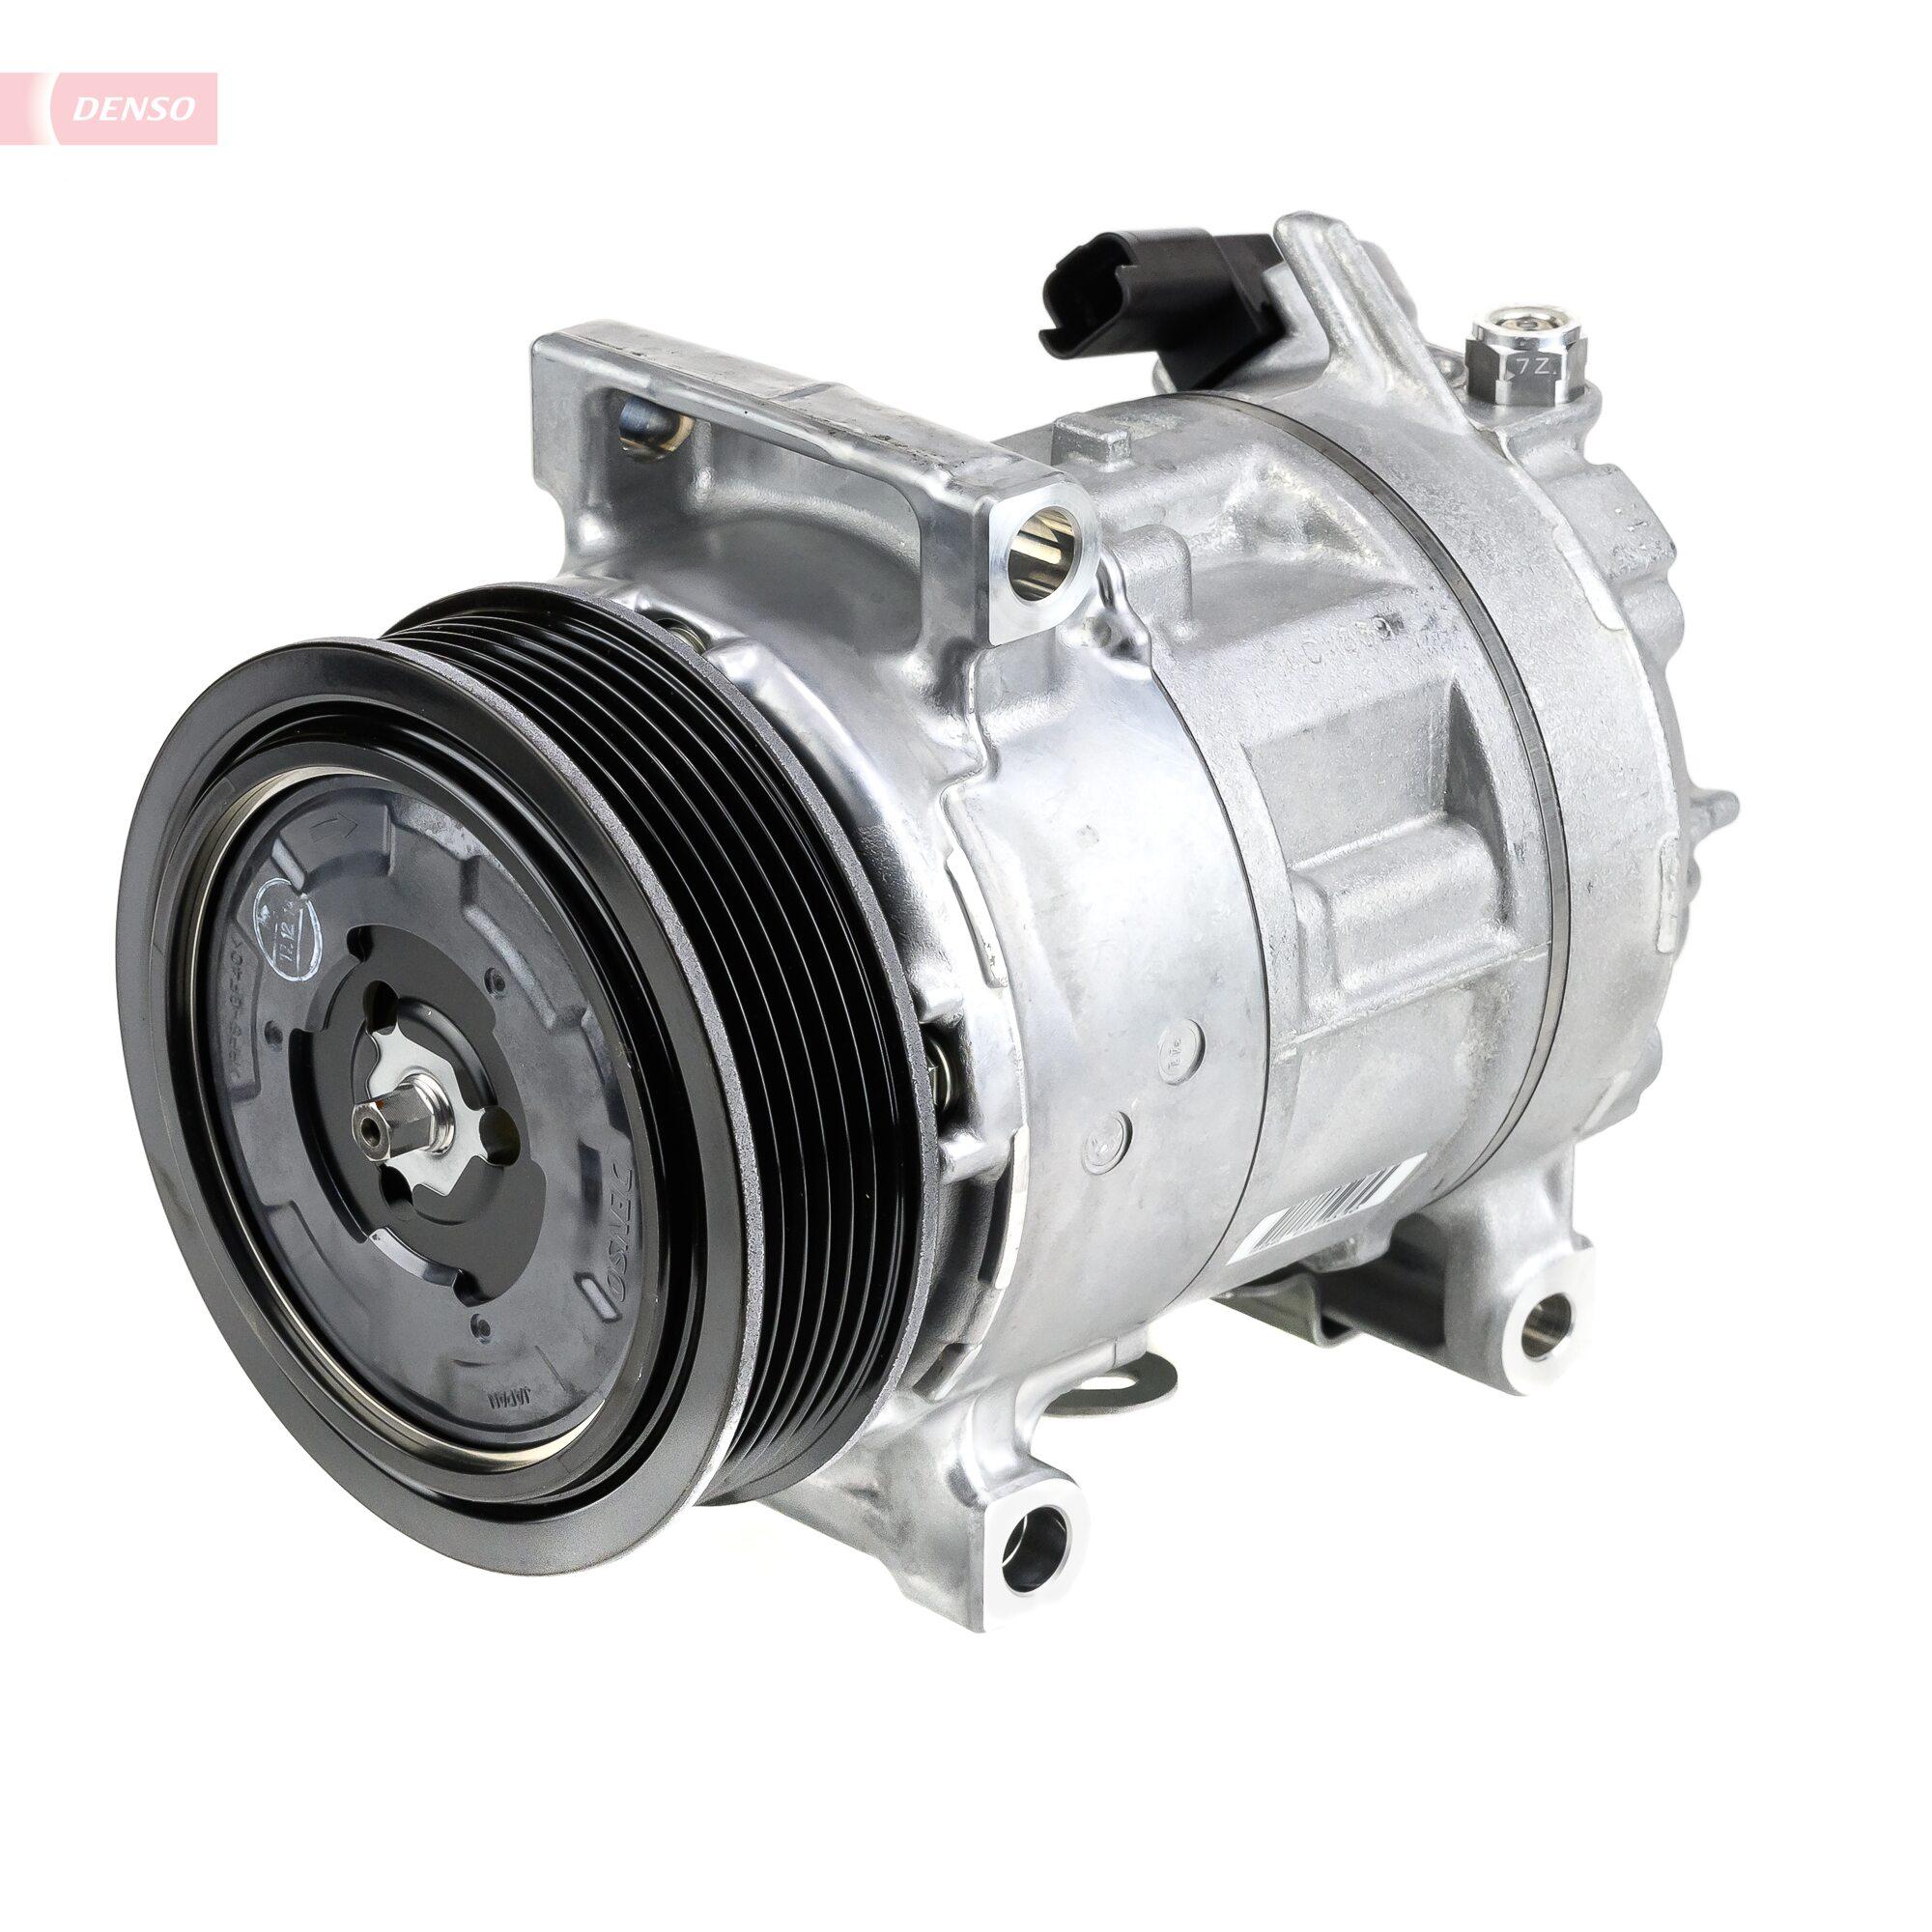 Kompresor klimatizace DENSO DCP21016